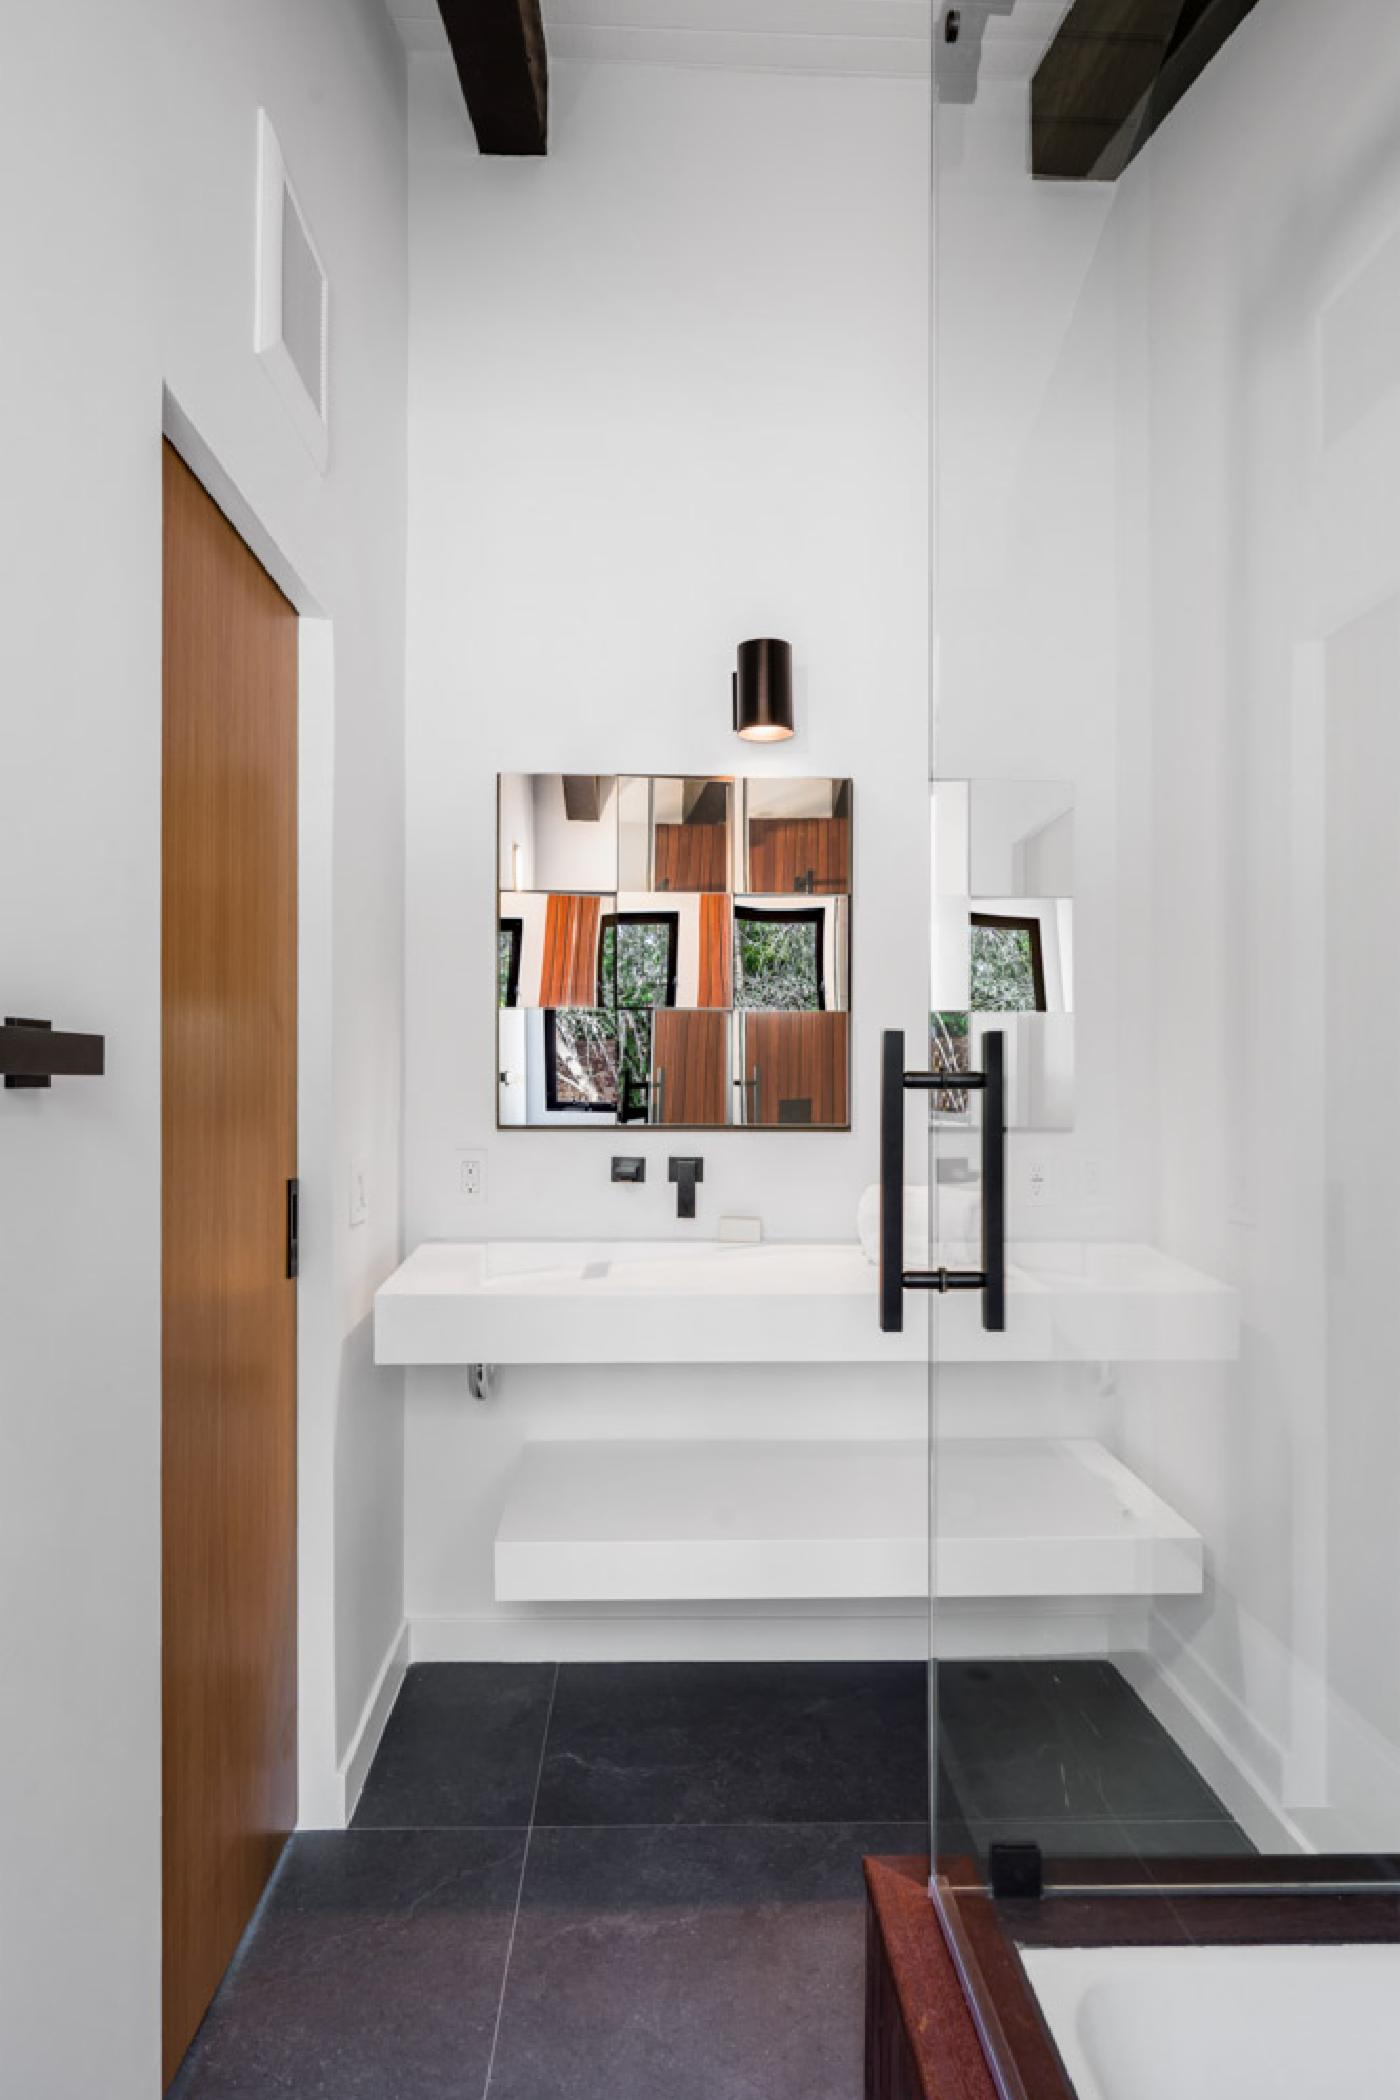 Mainfloor-2bedroom-bath2.jpg